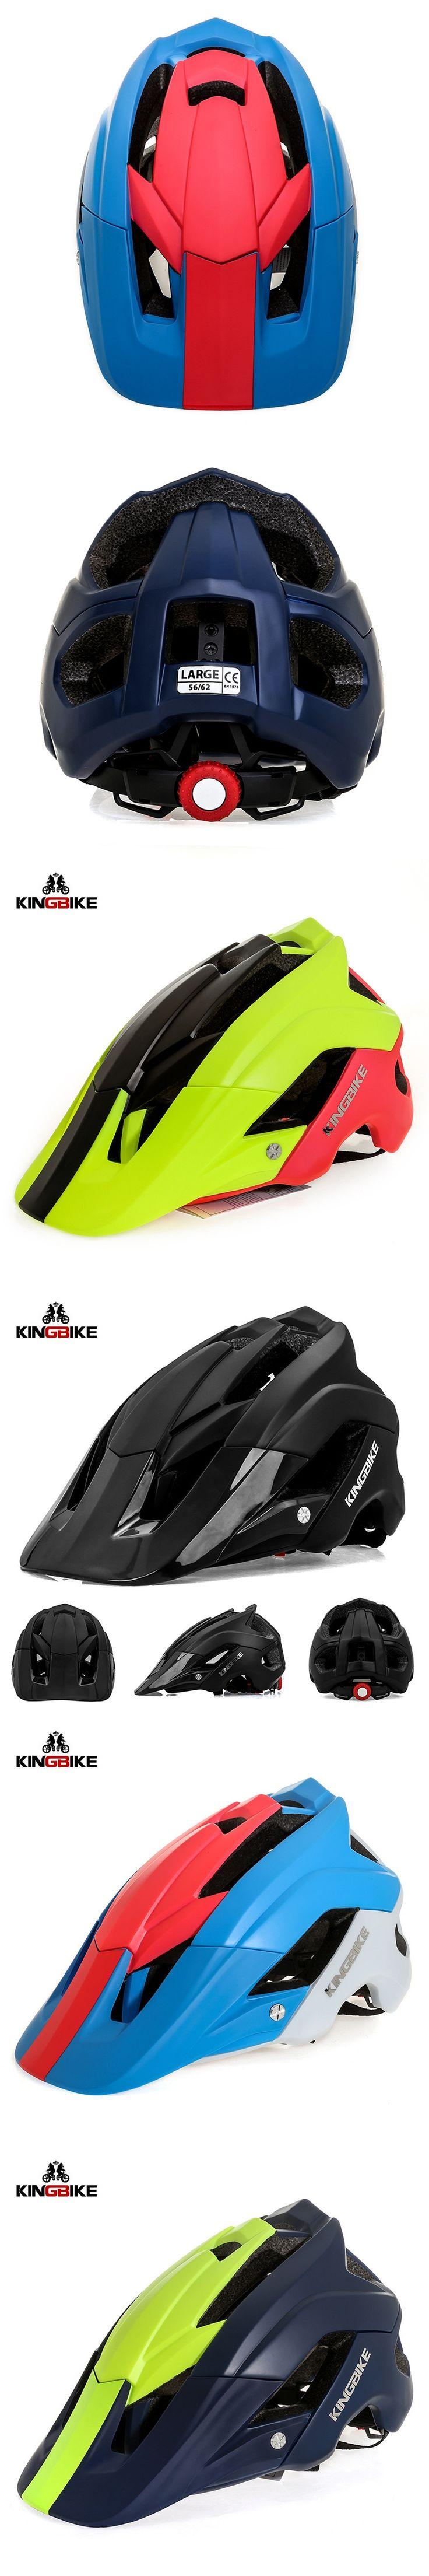 KINGBIKE MTB Road Cycling Helmet Integrally-molded Men Women Bicycle Helmets Capacete Casco Ciclismo Bike Helmets Safely Cap